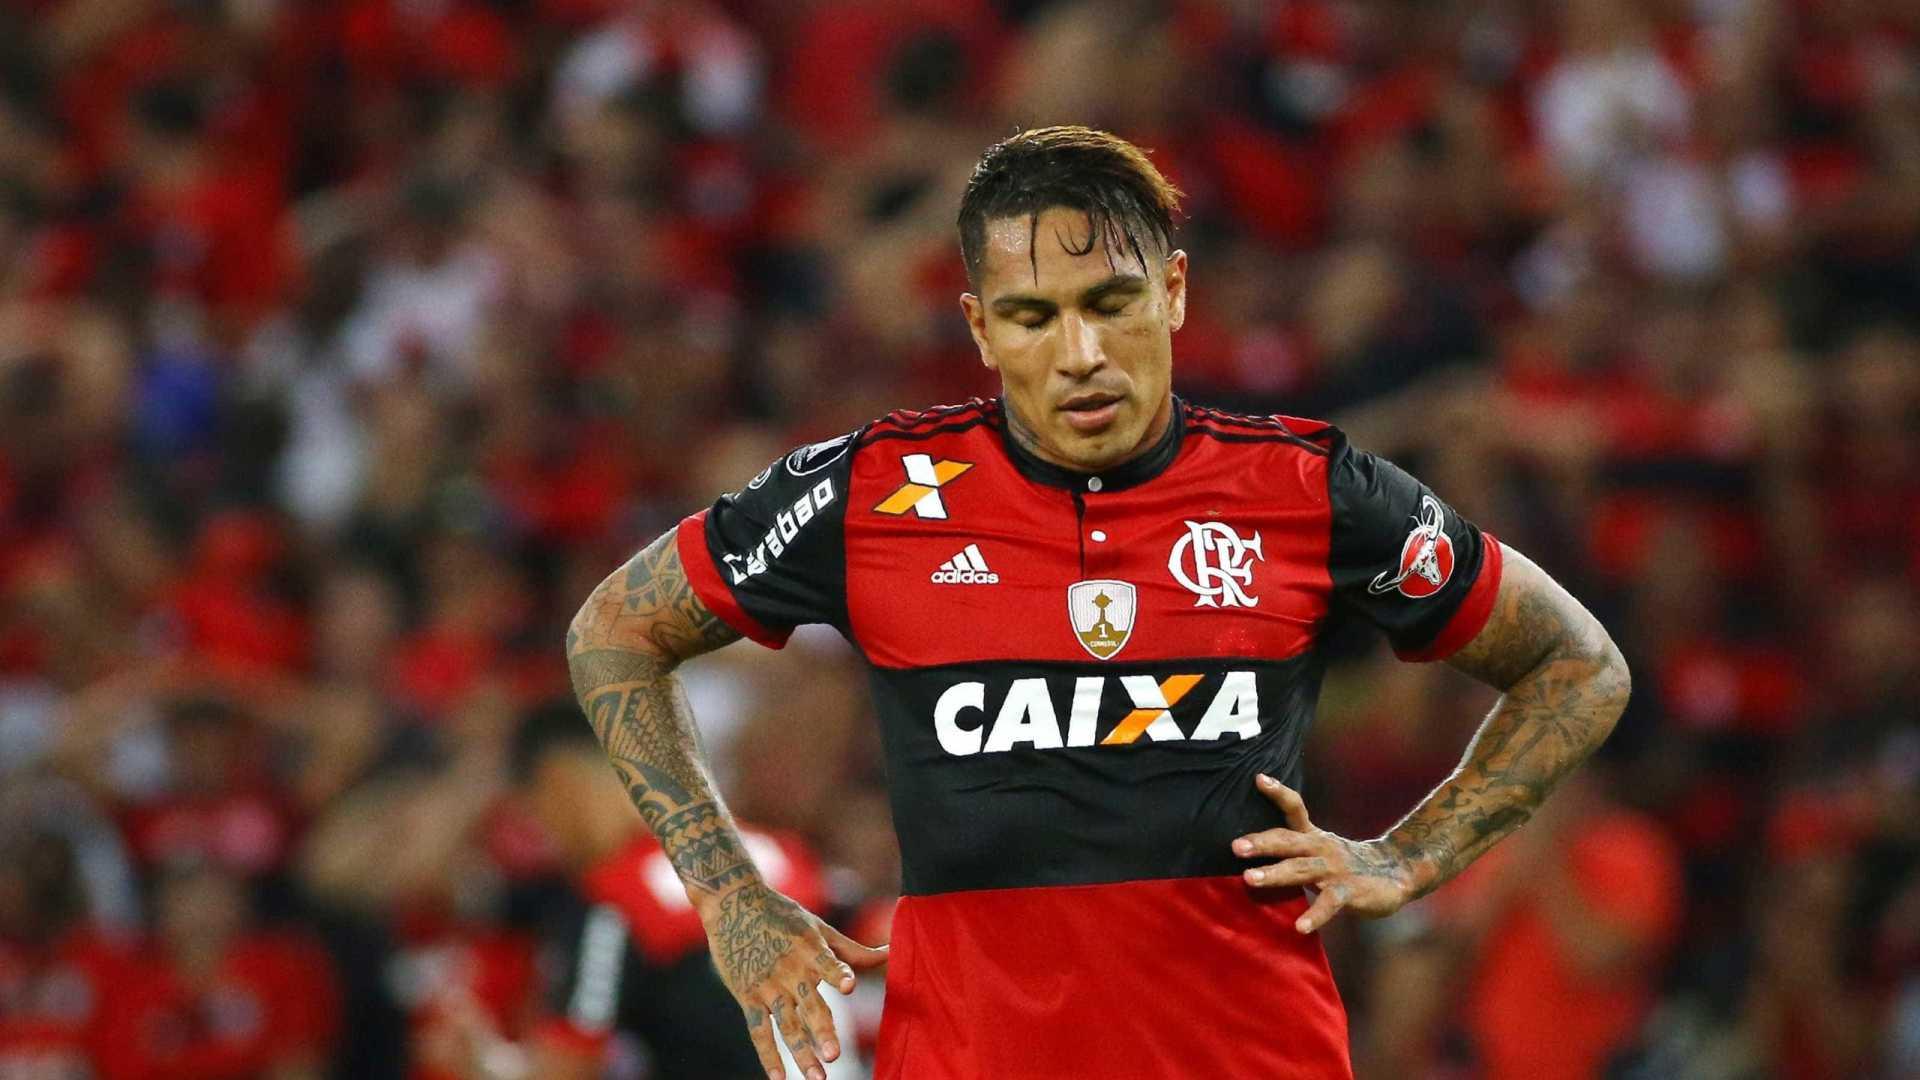 paolo guerrero - Flamengo planeja processar Paolo Guerrero por direitos de imagem